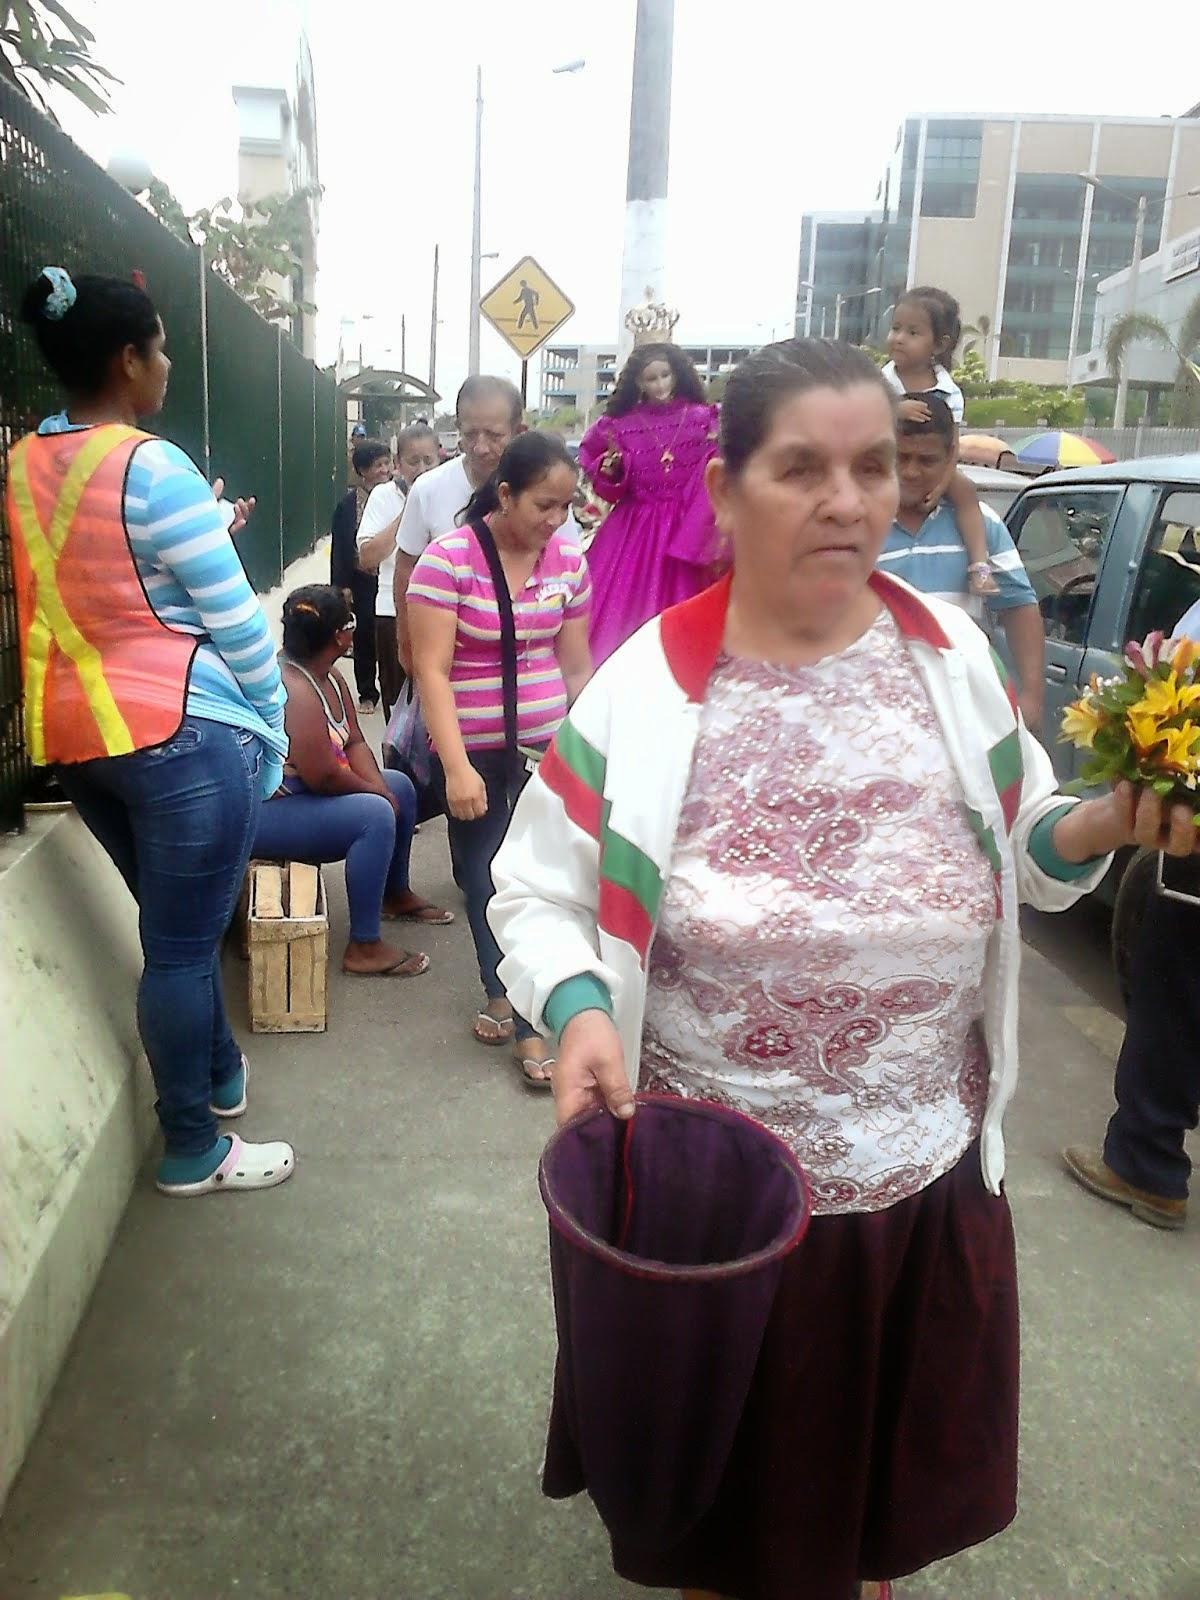 Novena Virgen del Cisne, Agosto 14, 2014